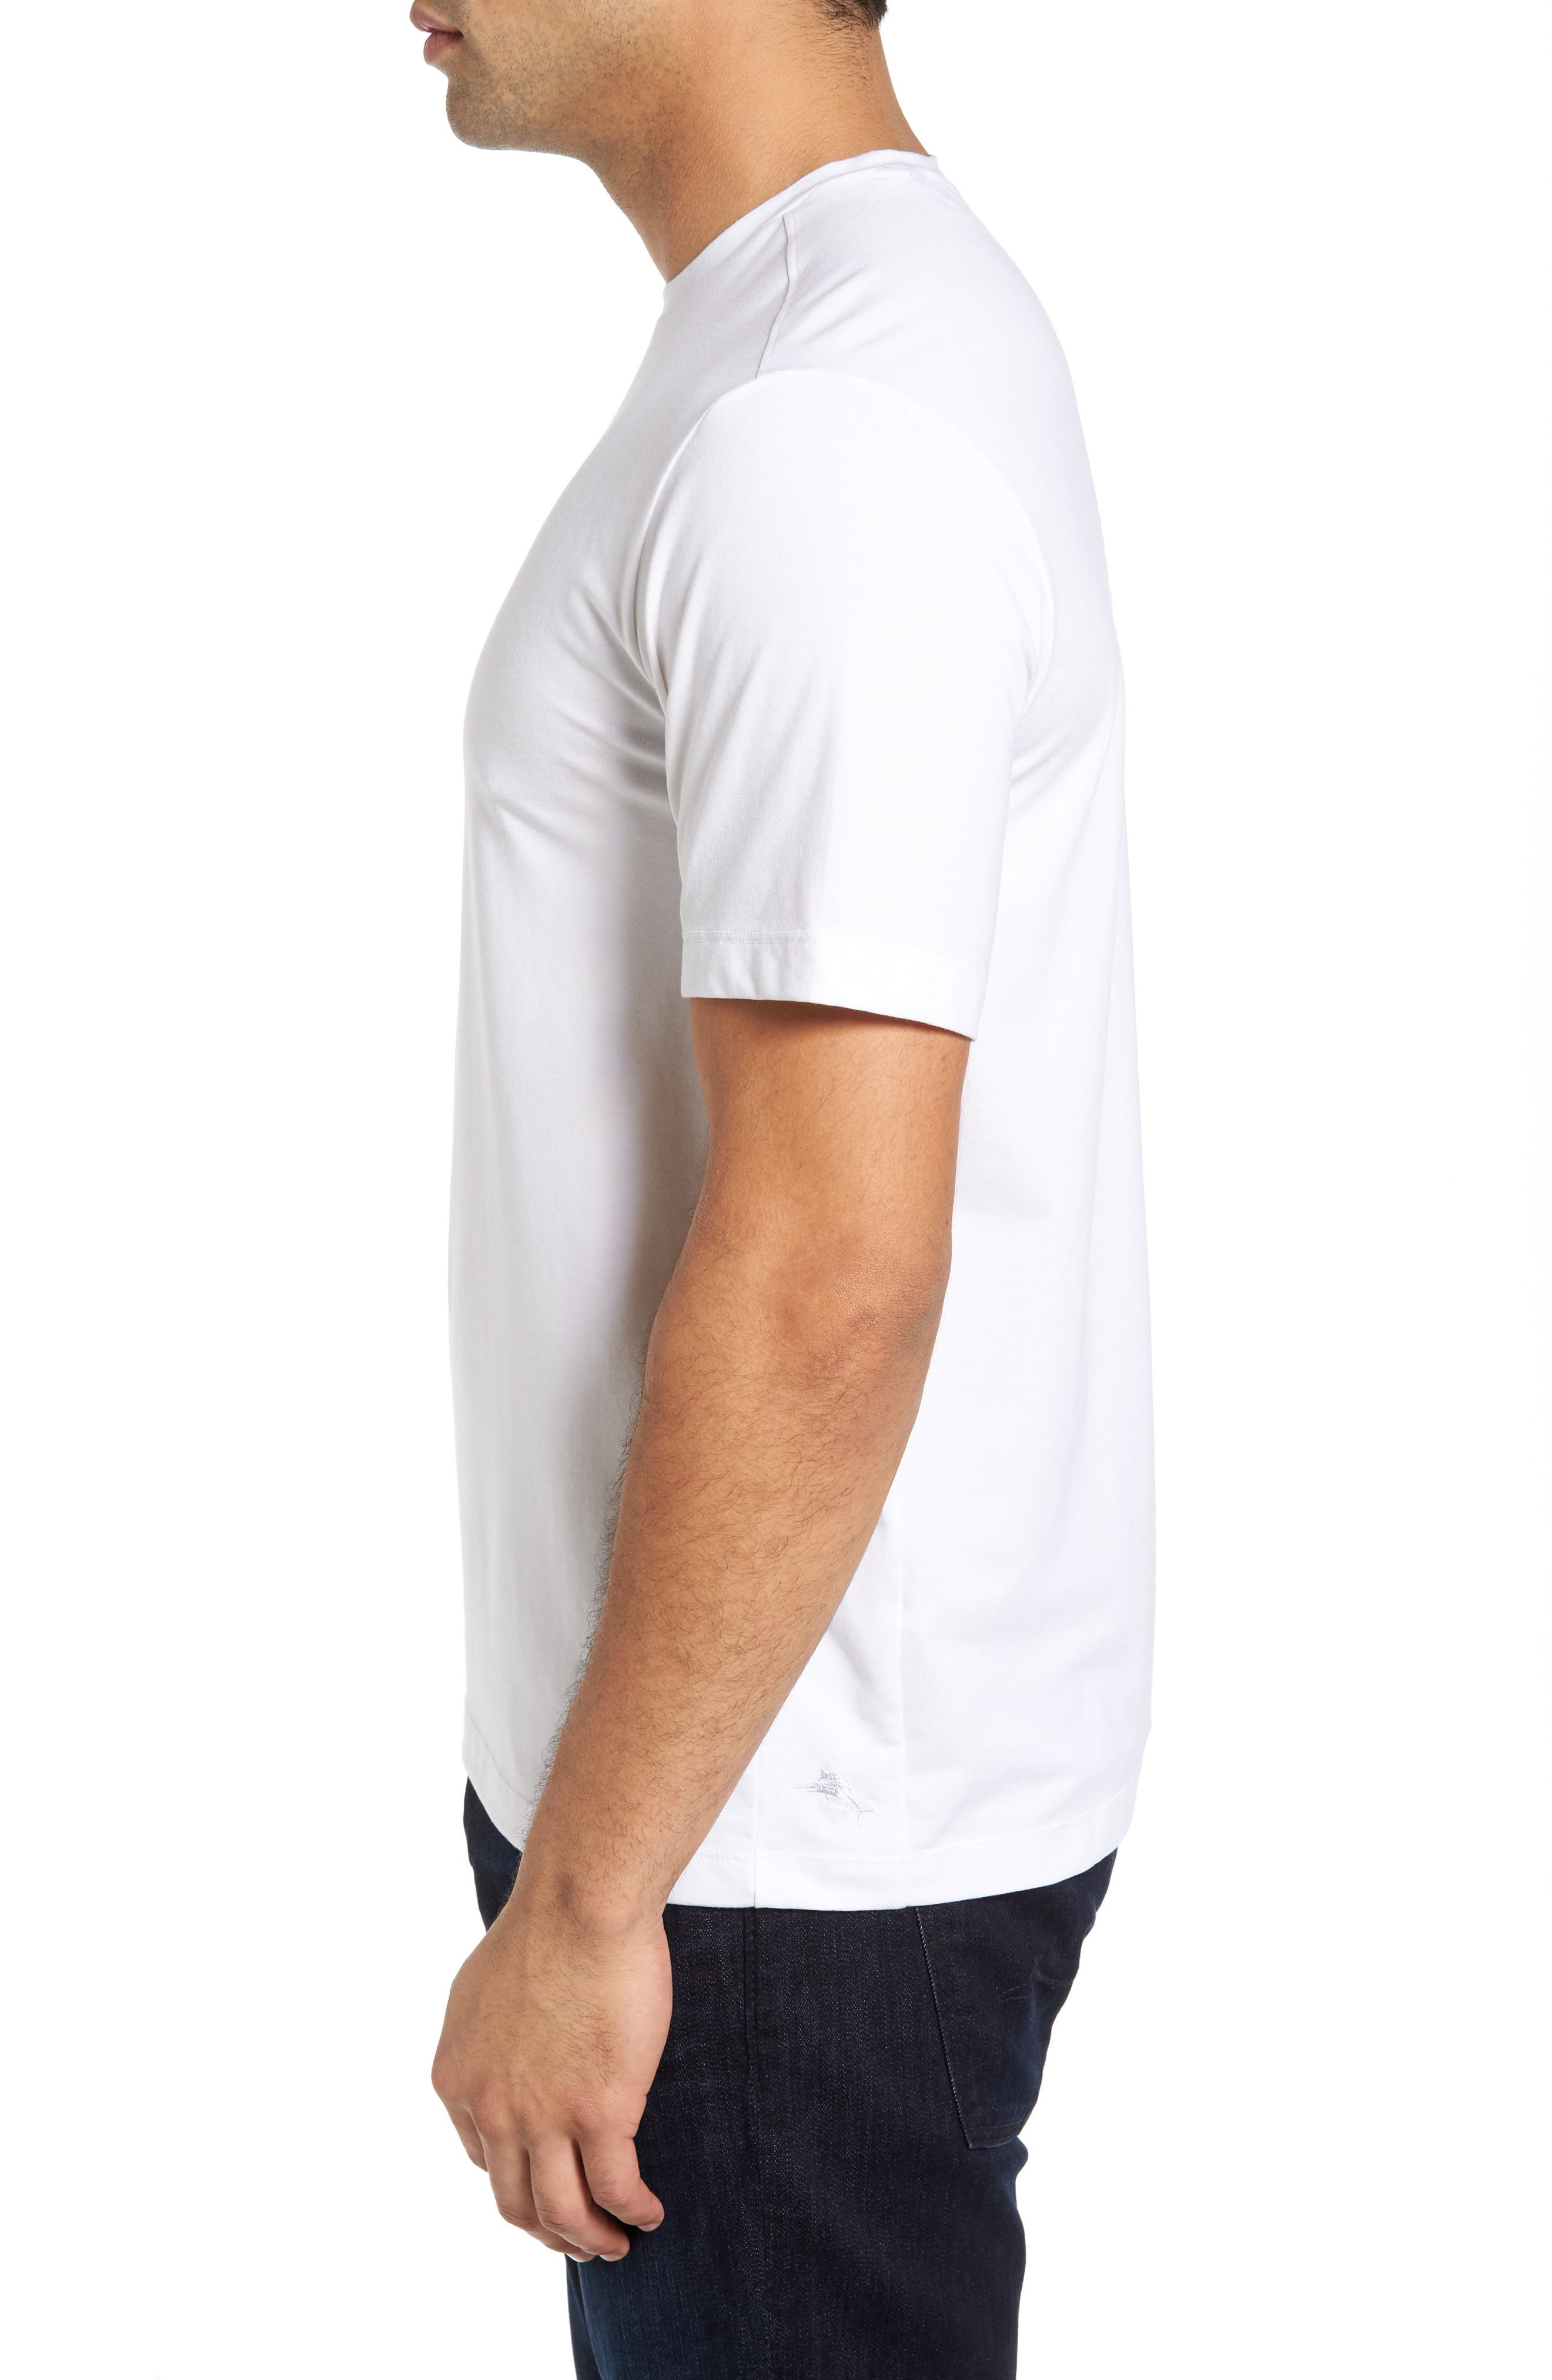 Tropicool T-Shirt,                             Alternate thumbnail 25, color,